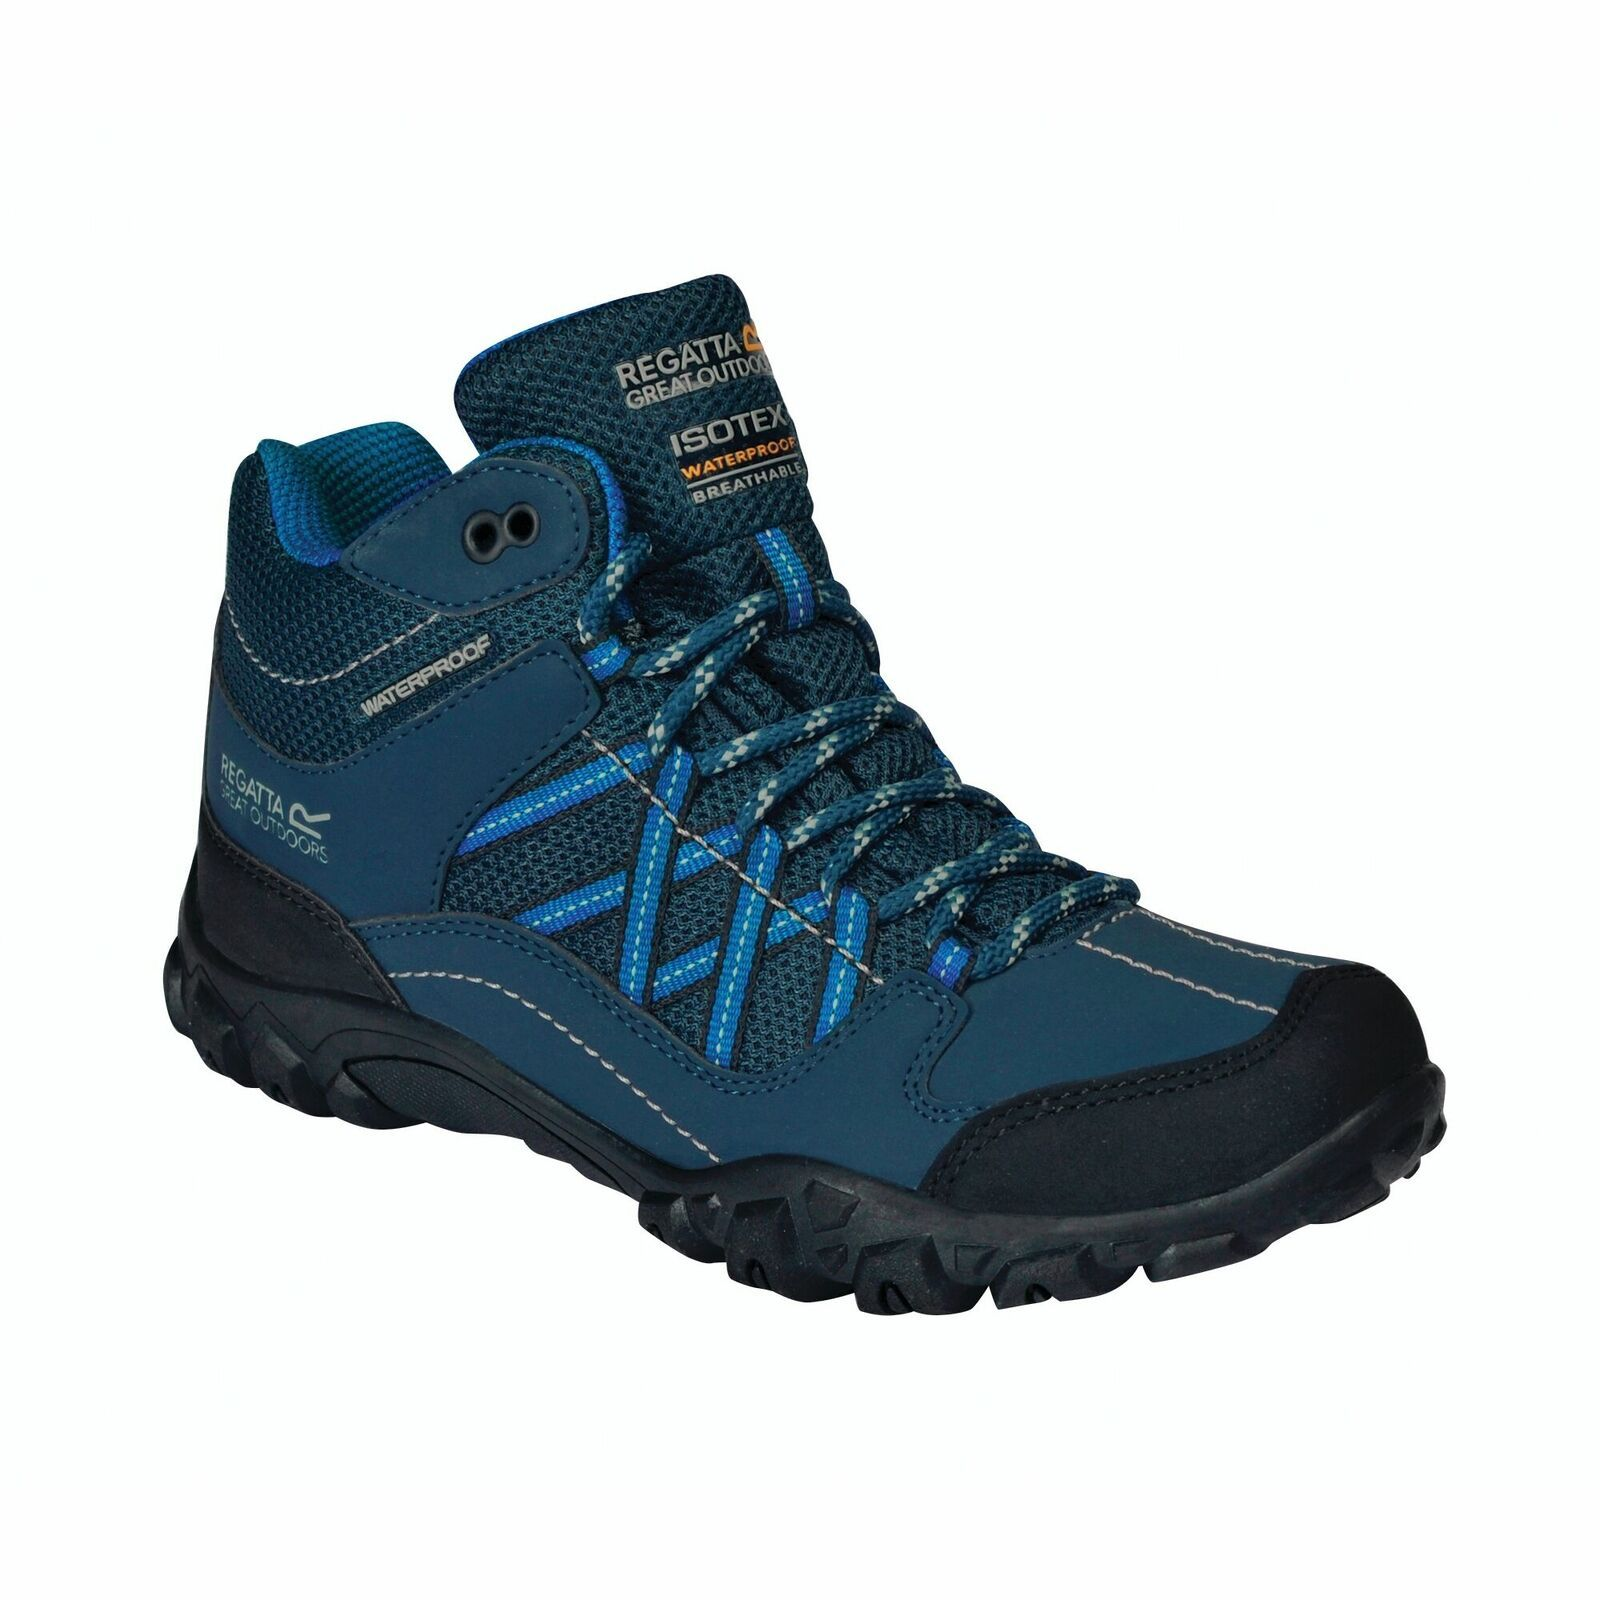 Regatta Childrens/Kids Edgepoint Boots (Deep Space Blue/Imperial Blue)